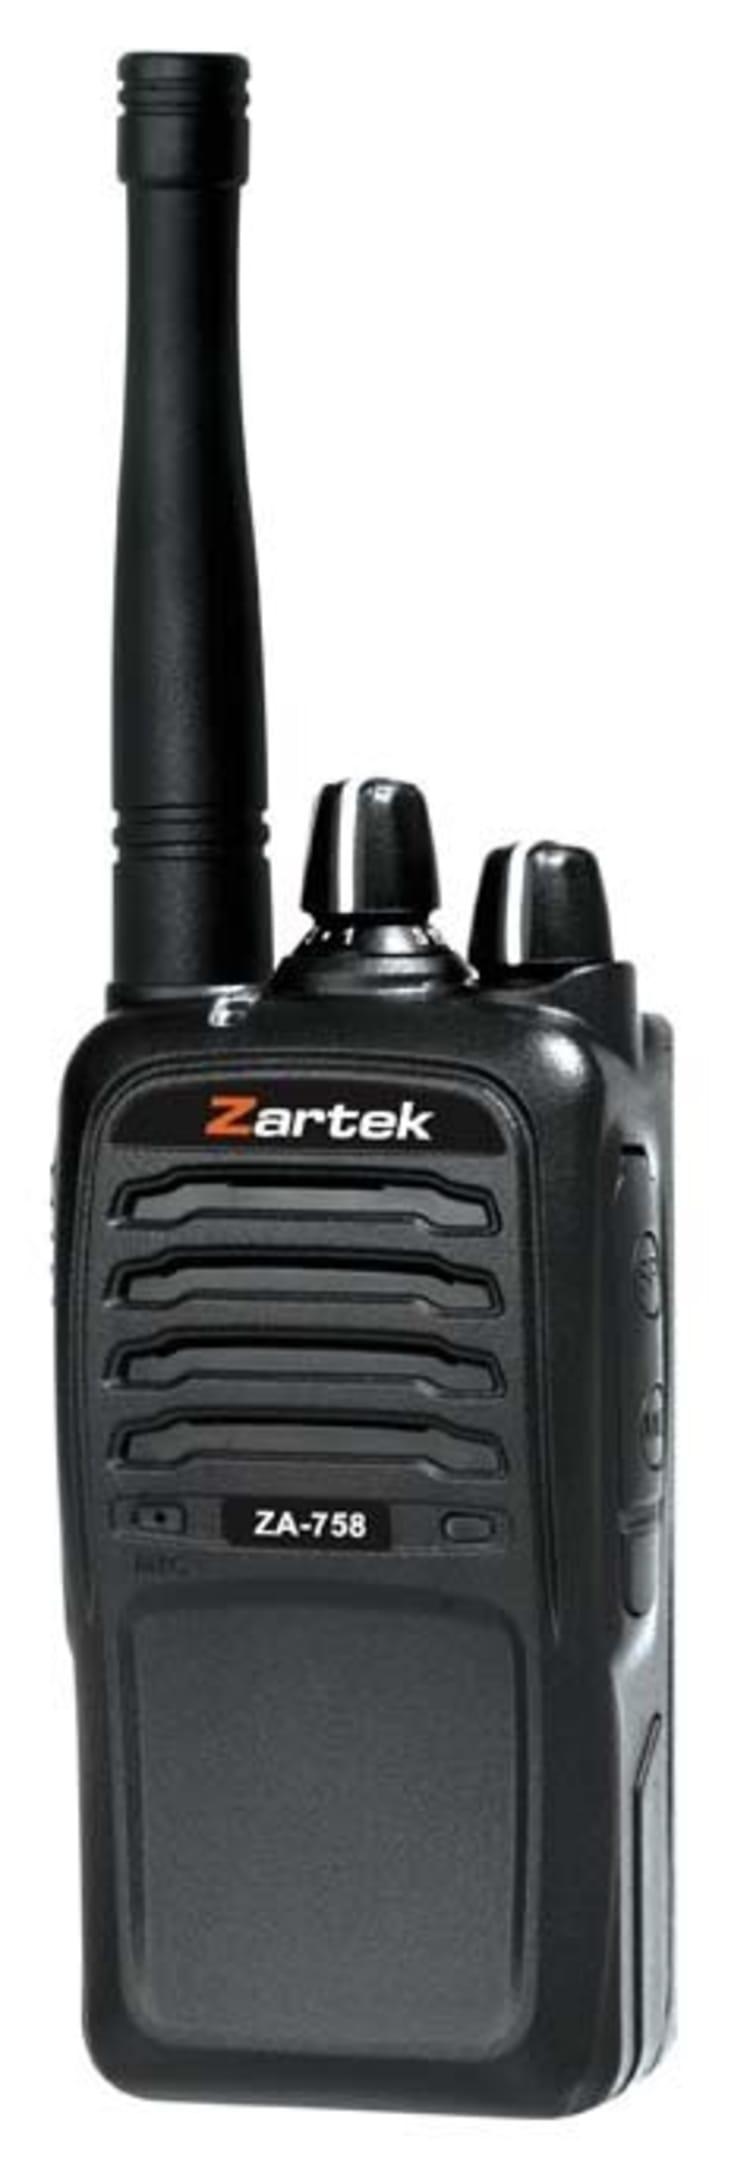 Zartek ZA-758 2-Way Radio - default